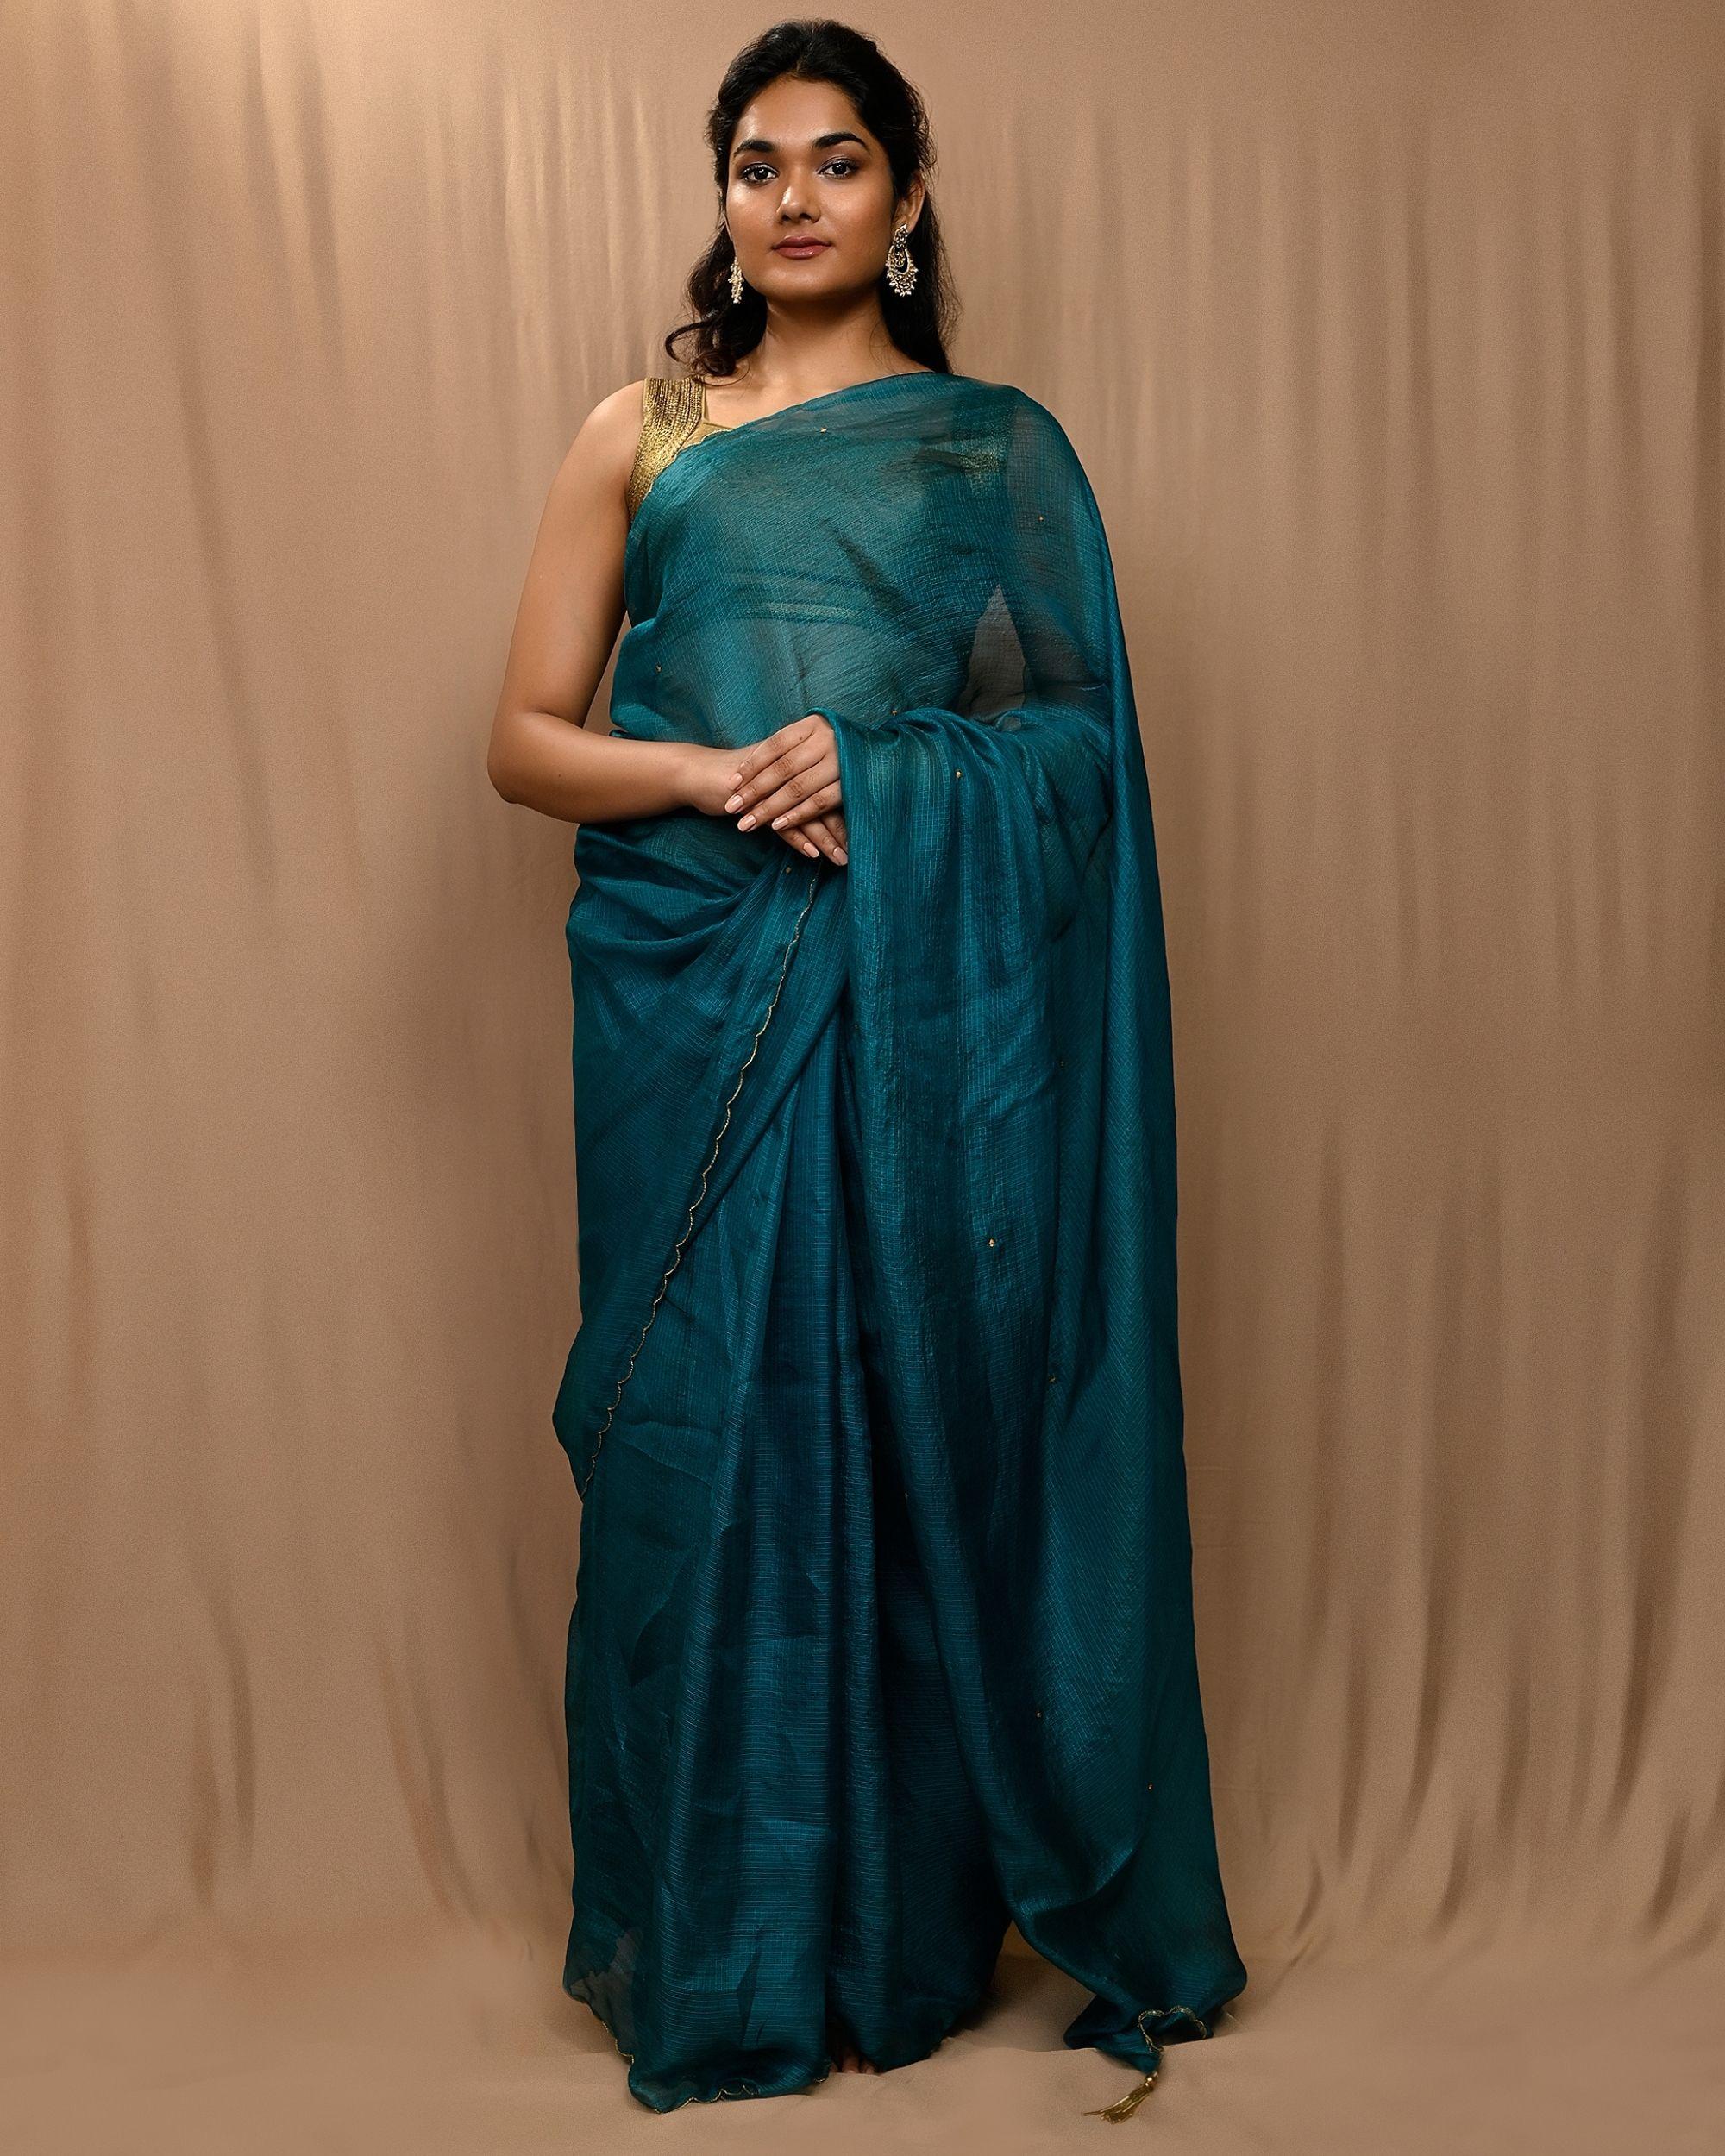 Teal green embroidered kota silk scalloped sari